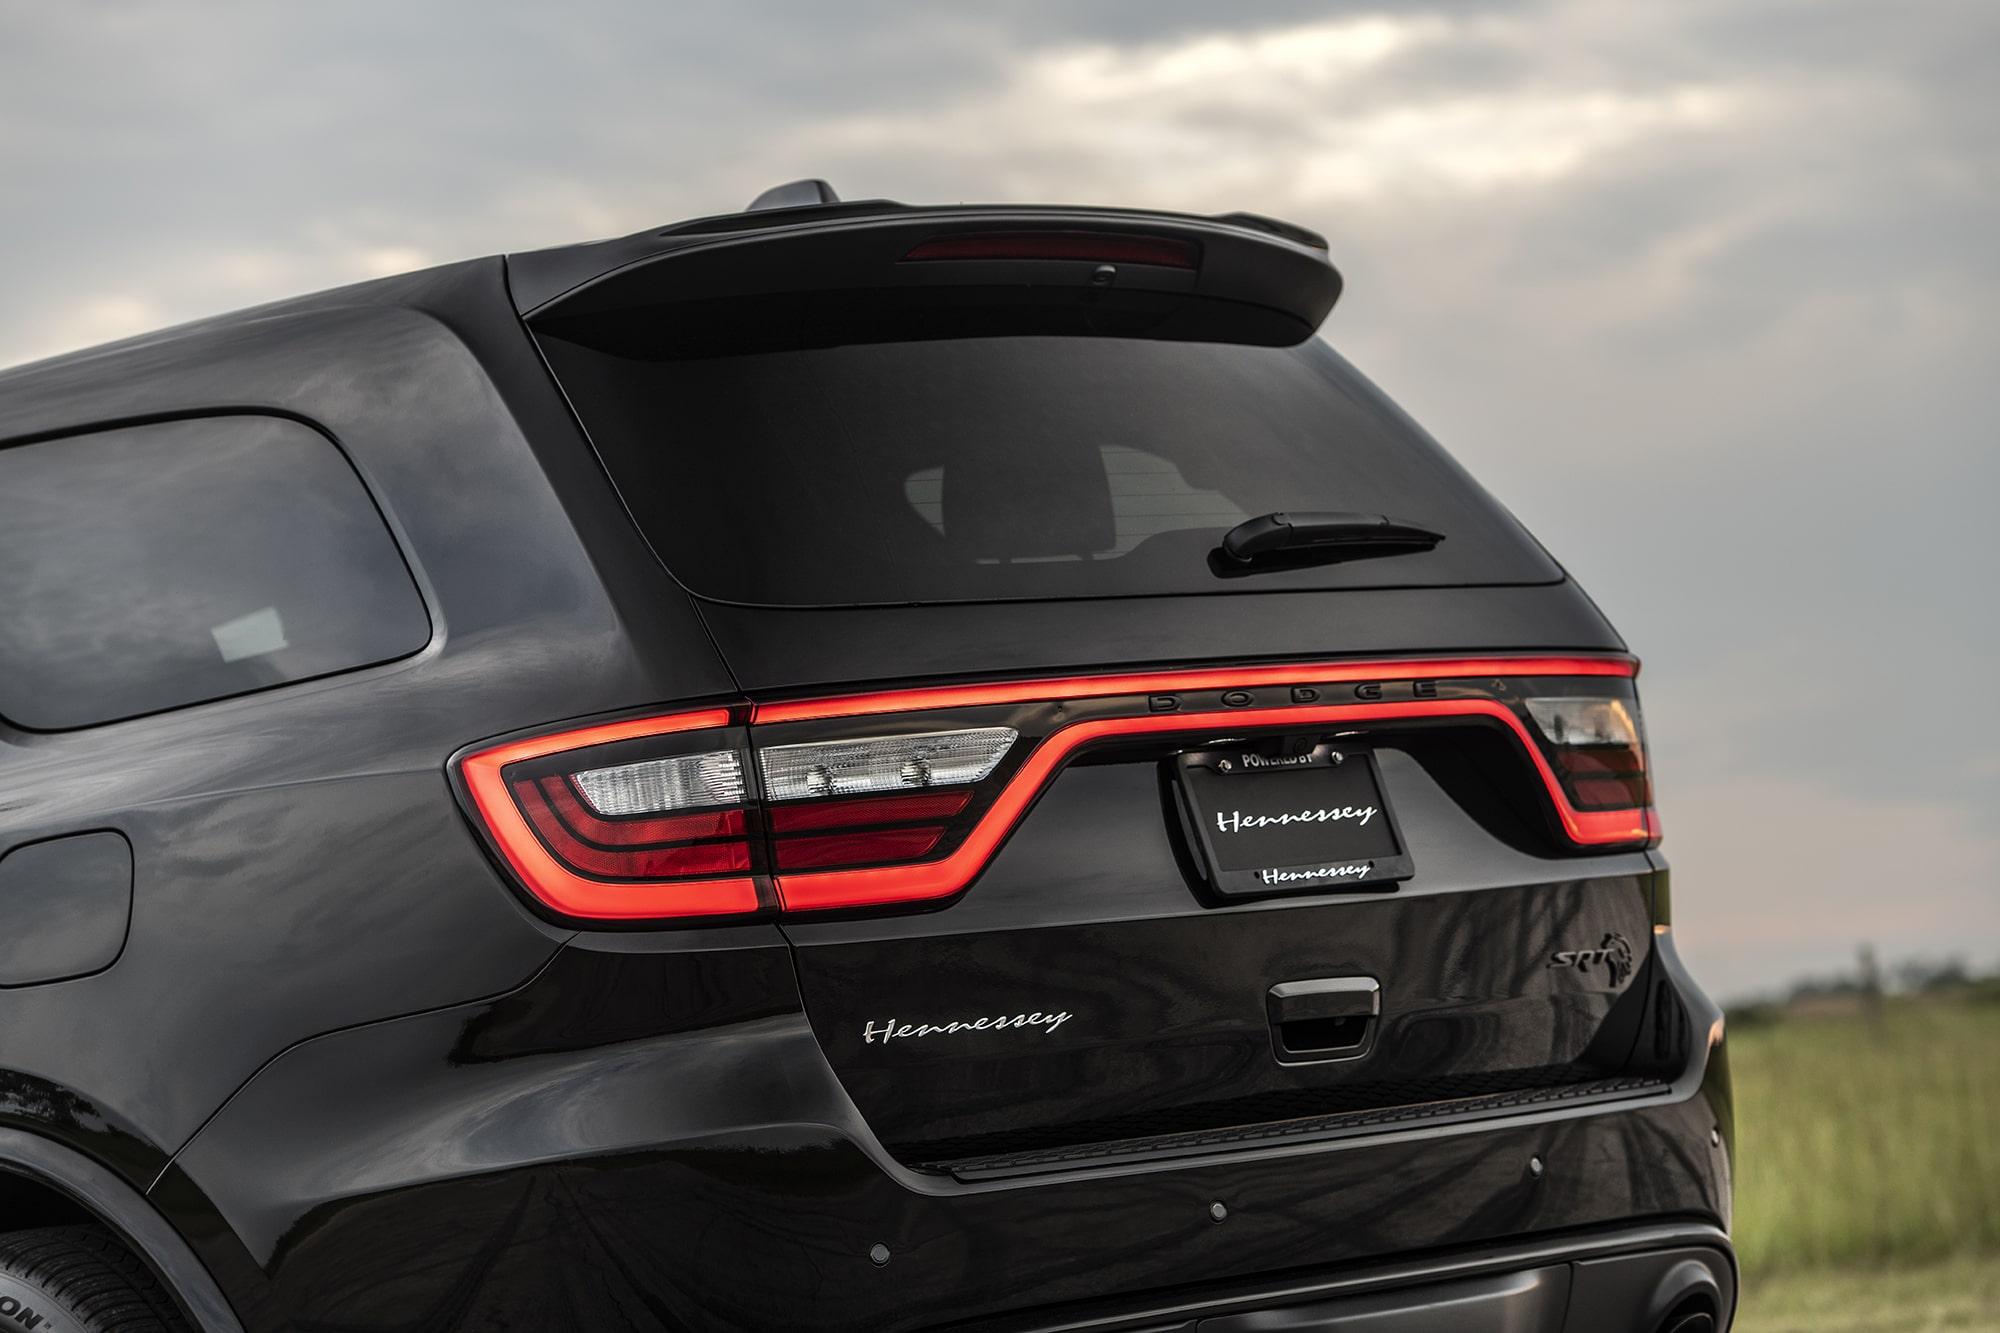 2021 Dodge Durango SRT Hellcat Upgrade by Hennessey Performance